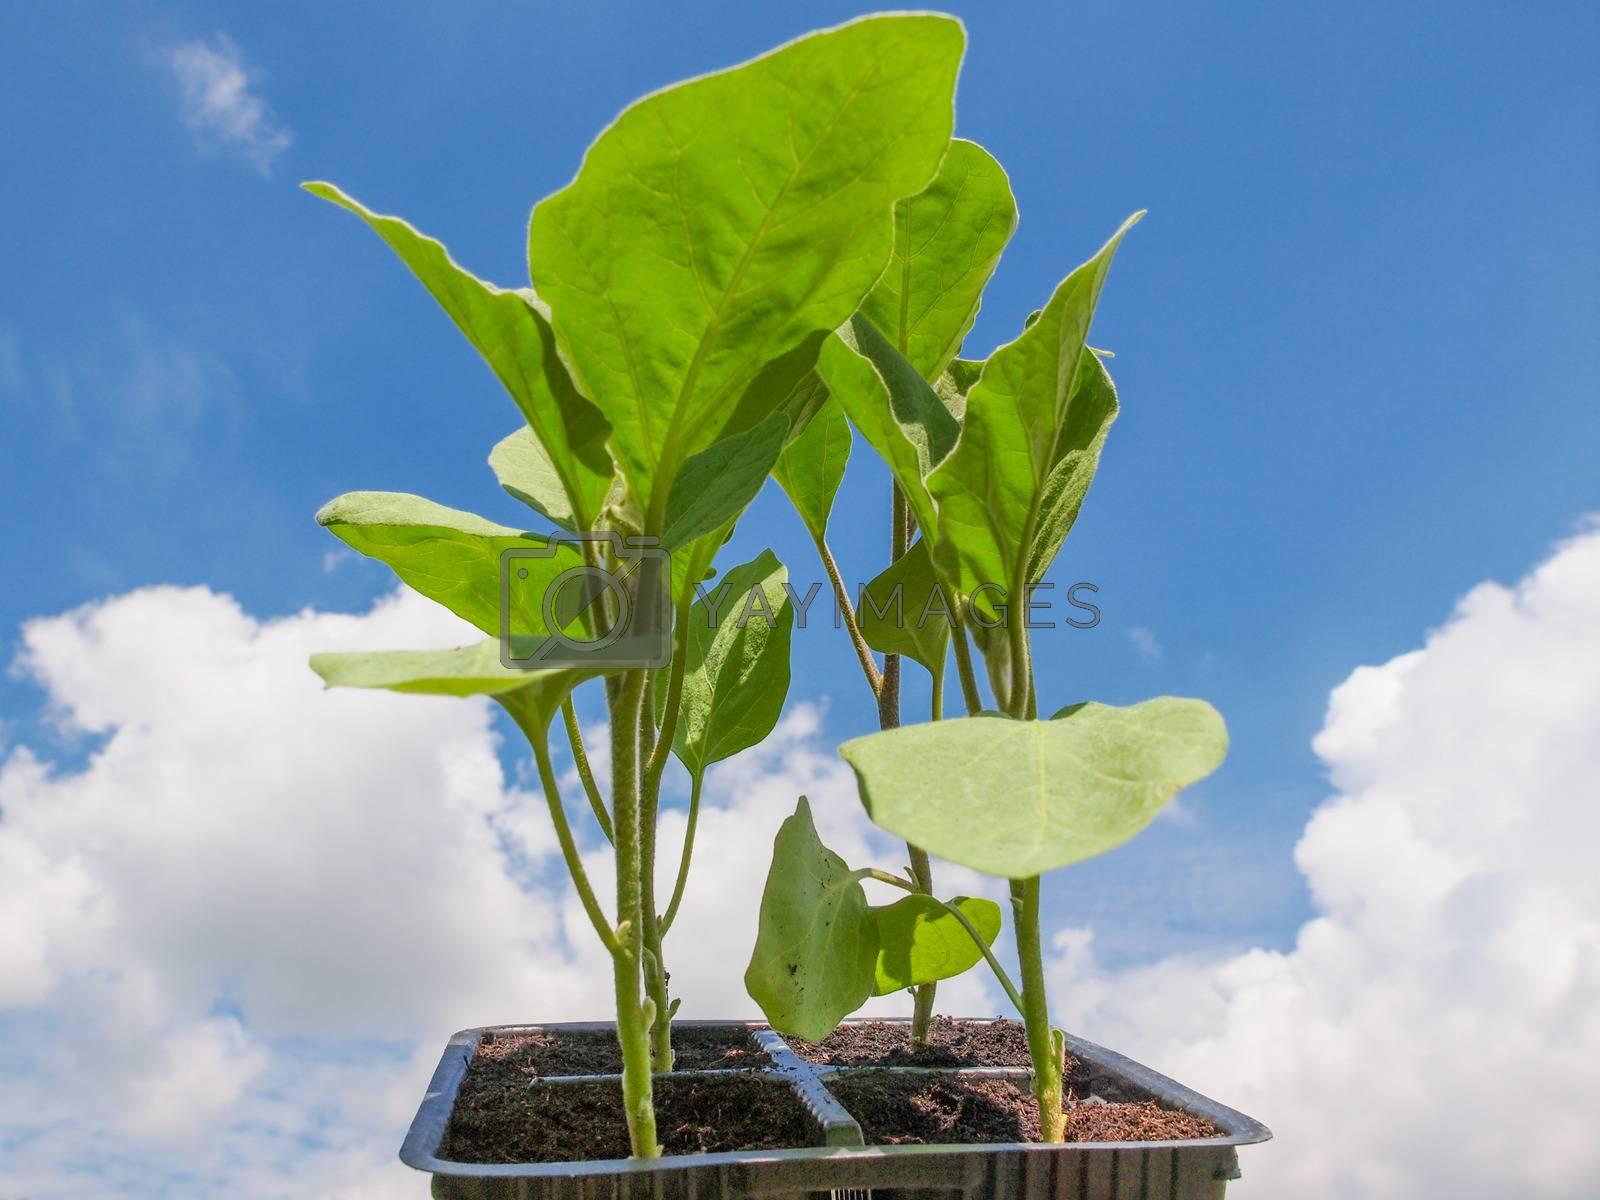 Royalty free image of Plug aubergine plant by claudiodivizia